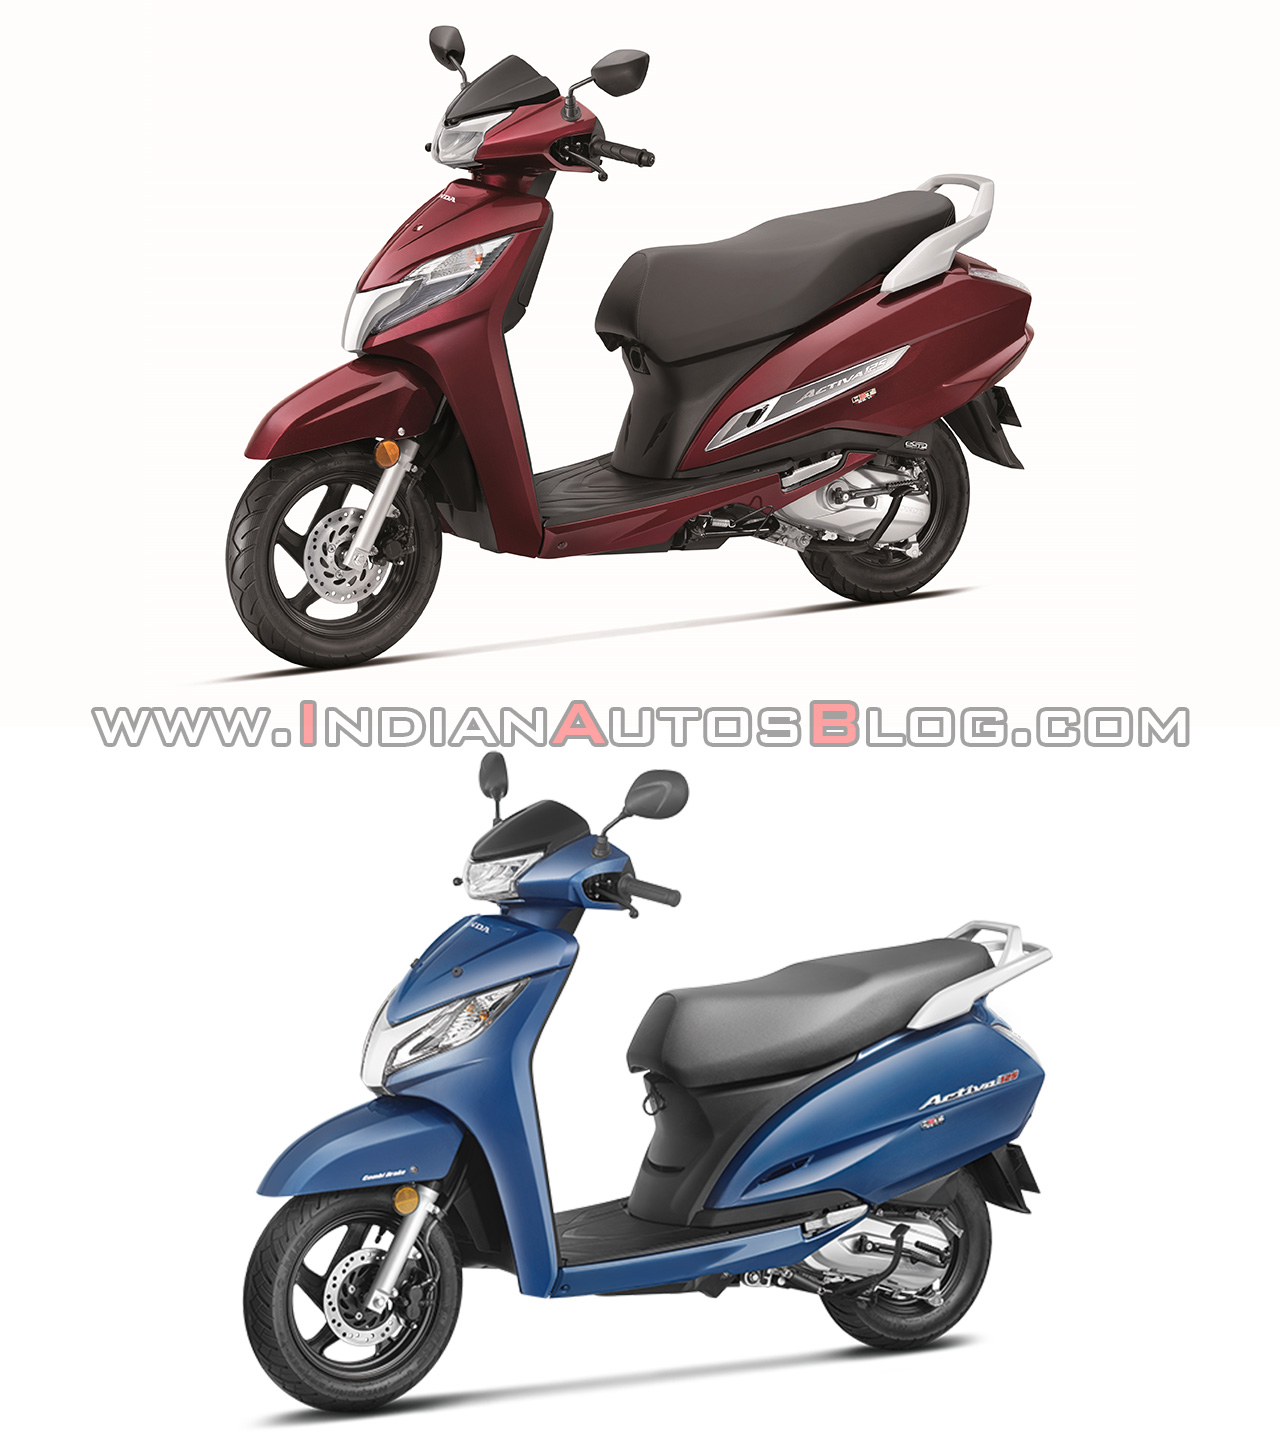 Bs Vi Honda Activa 125 Vs Bs Iv Honda Activa 125 Old Vs New